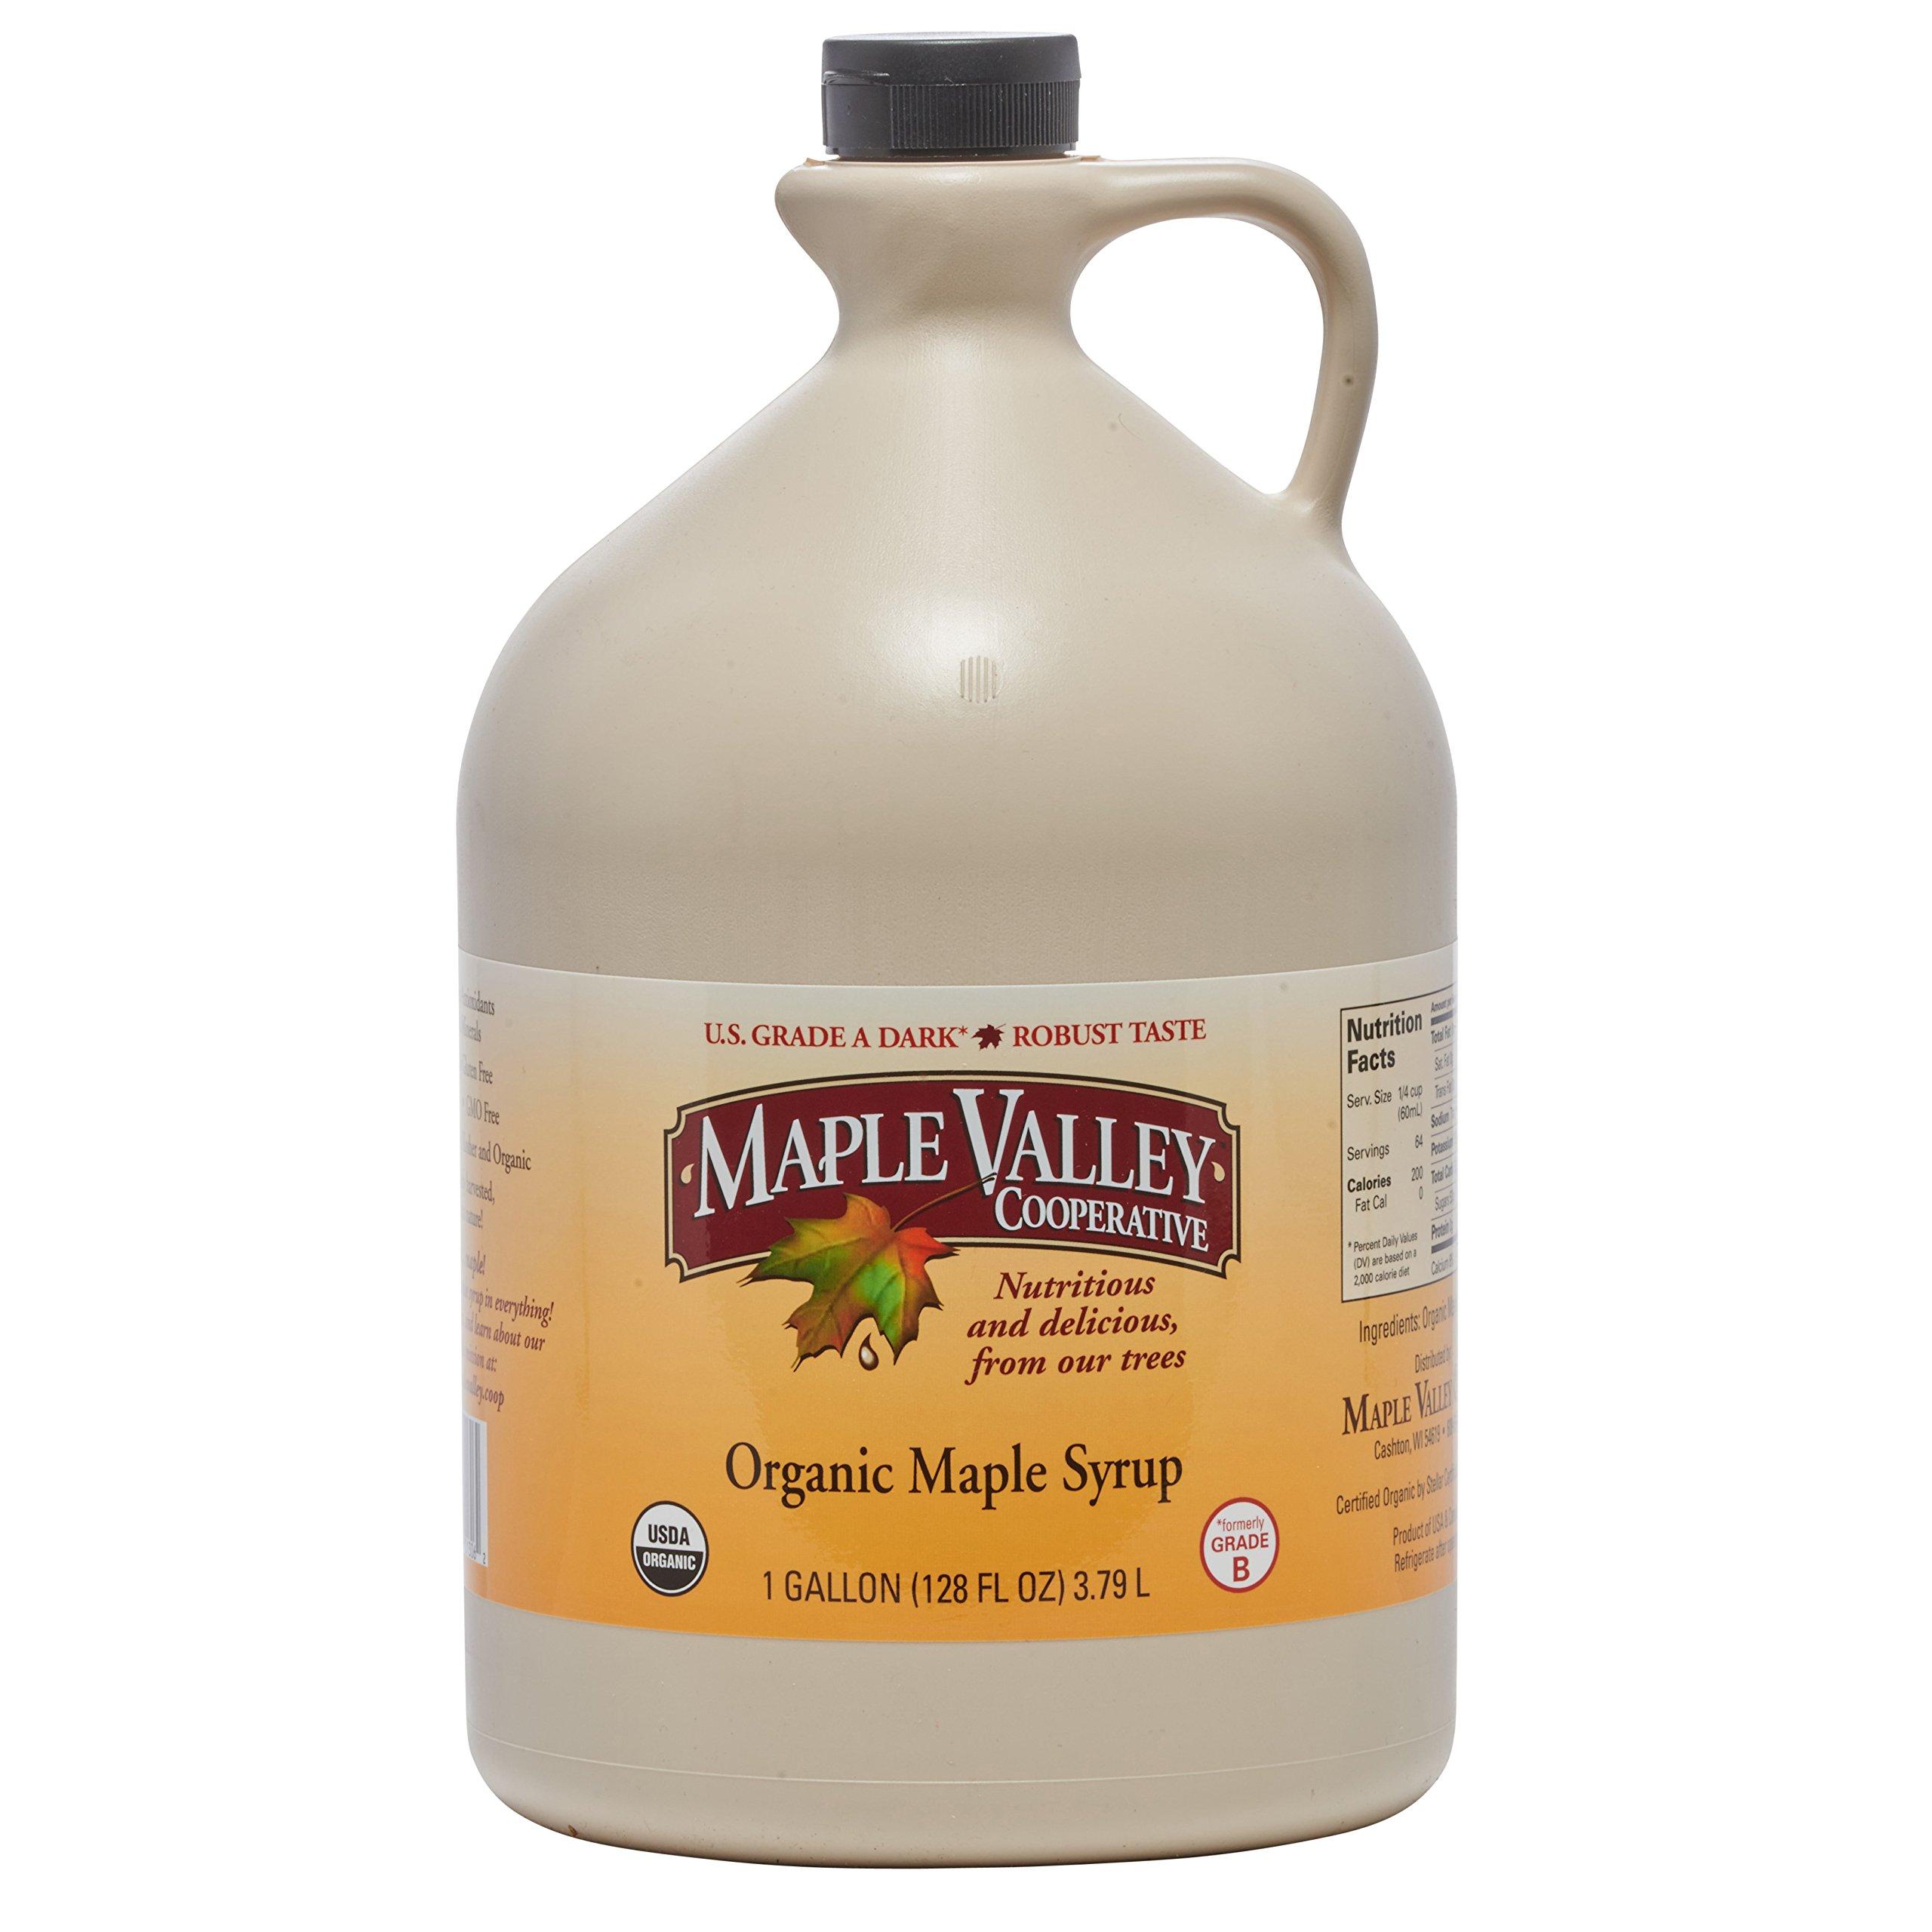 Maple Valley 128 Oz. (Gallon) Organic Maple Syrup - Grade A Dark & Robust (formerly Grade B)